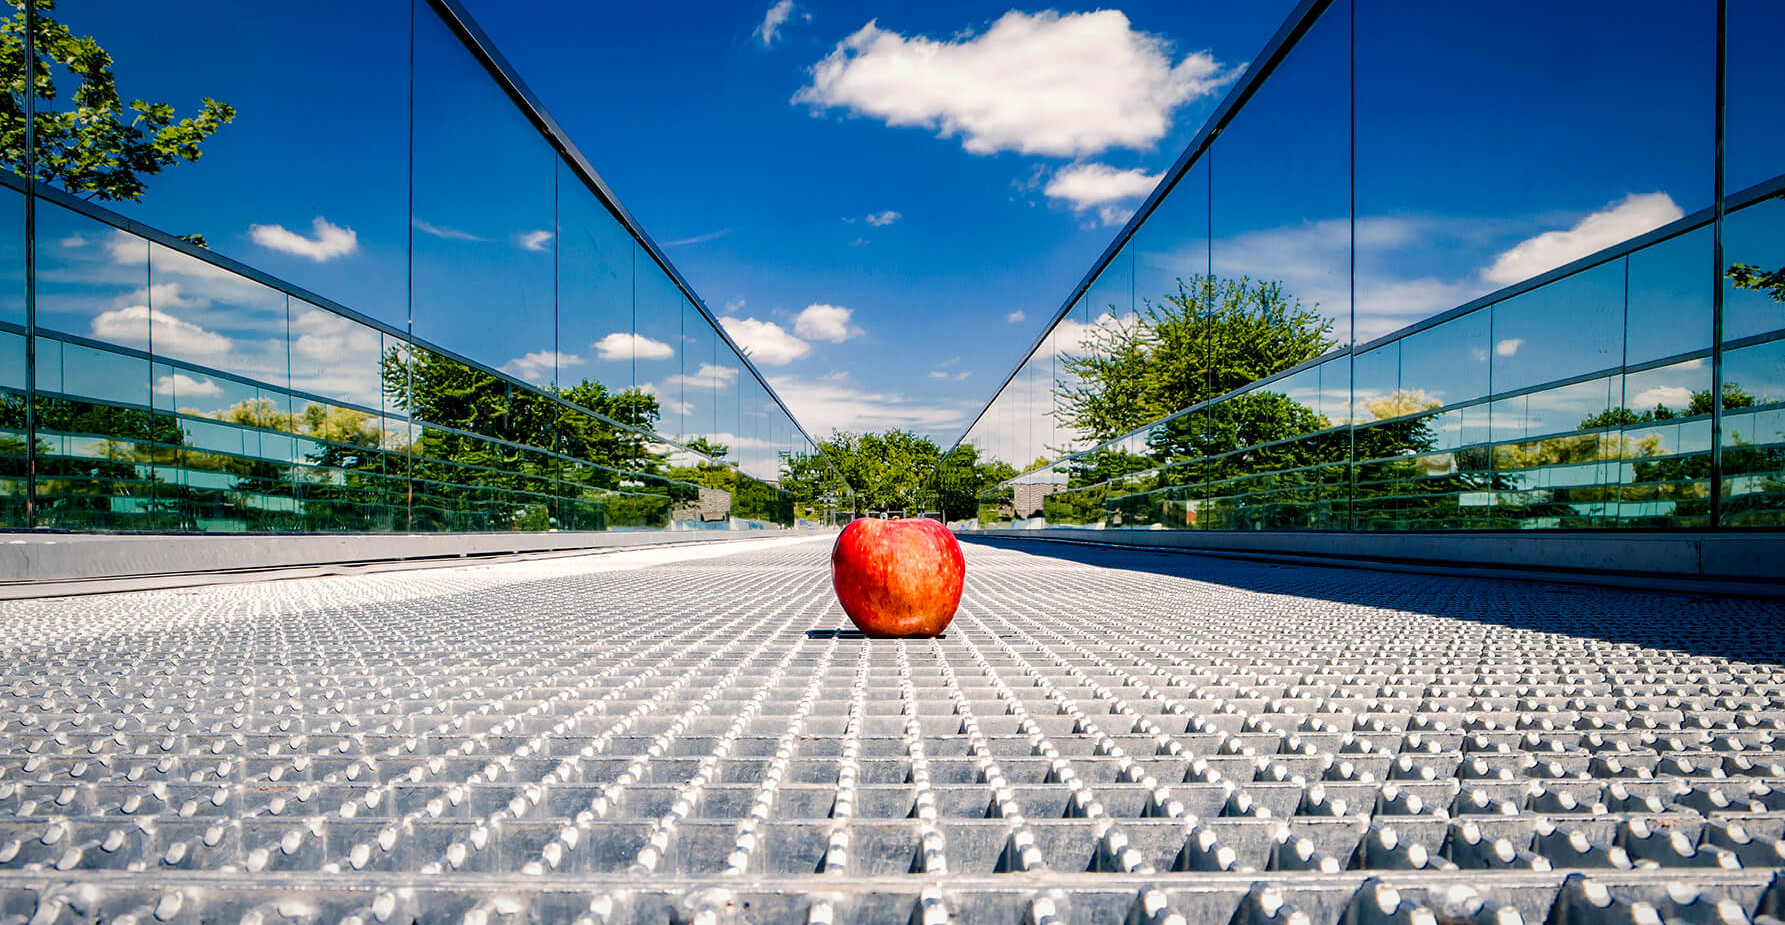 The Fantastic Apple